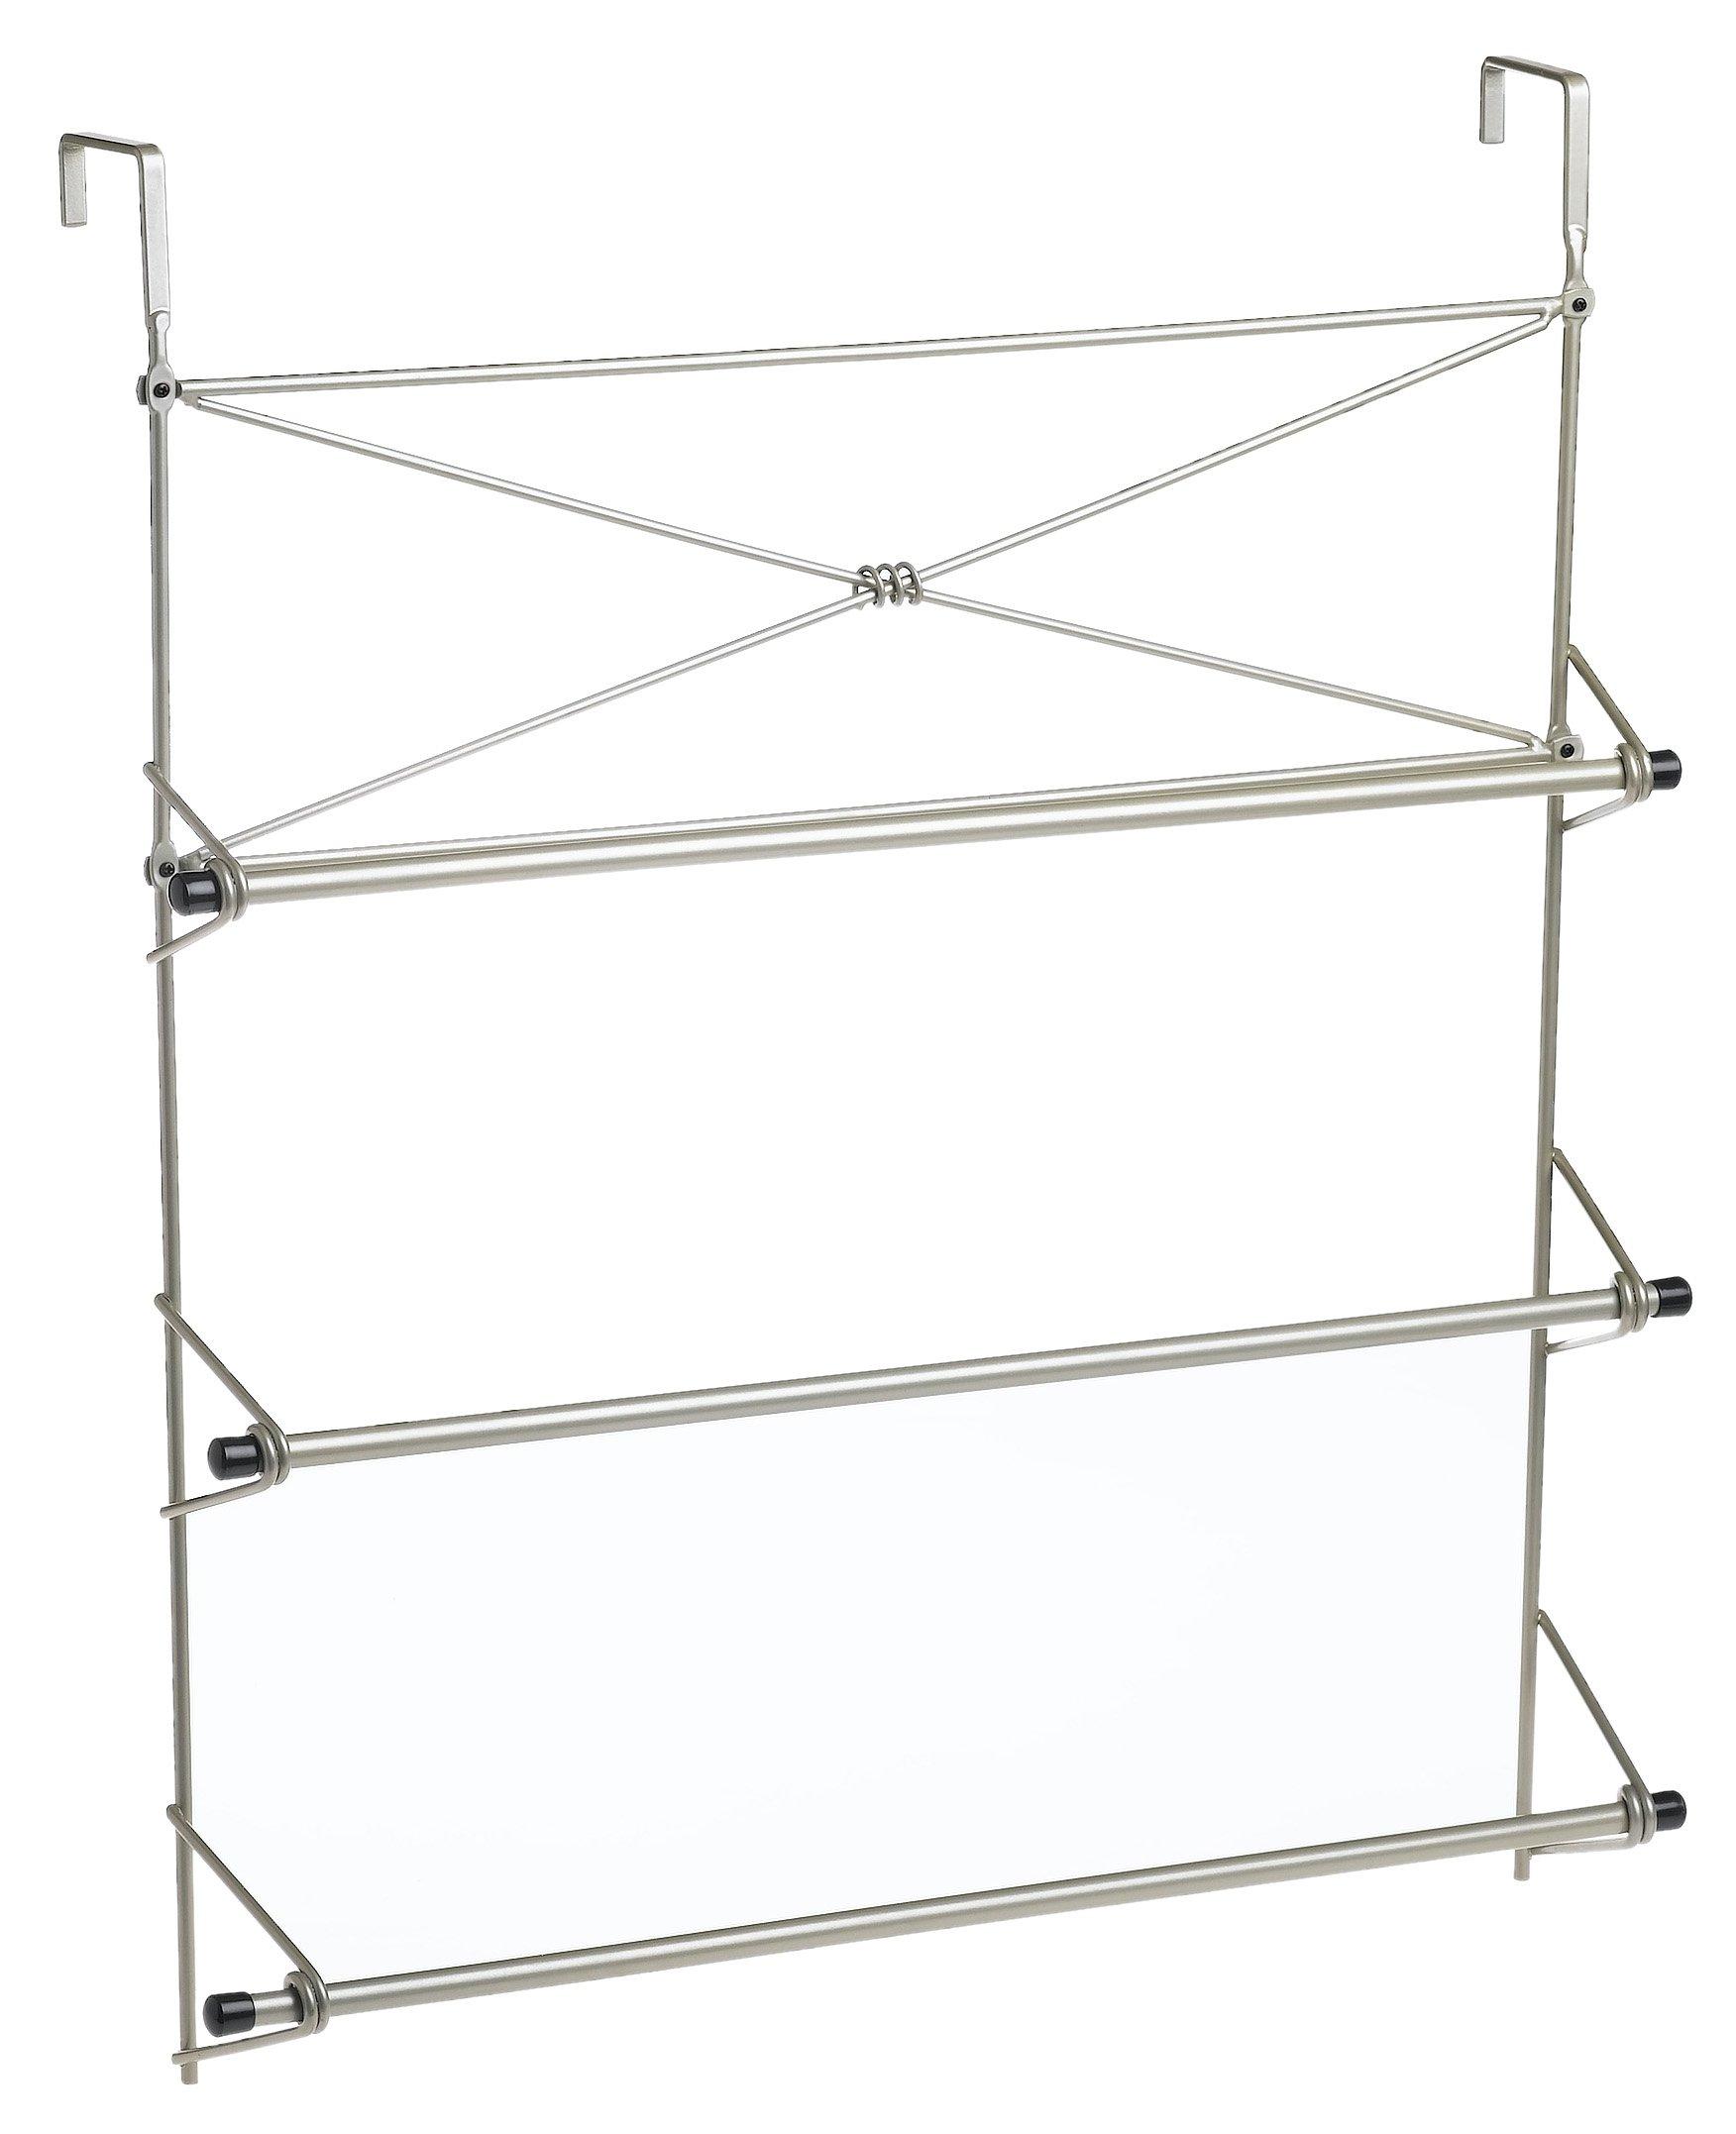 Zenna Home 2526NN, Cross Style Towel Rack, Satin Nickel by Zenna Home